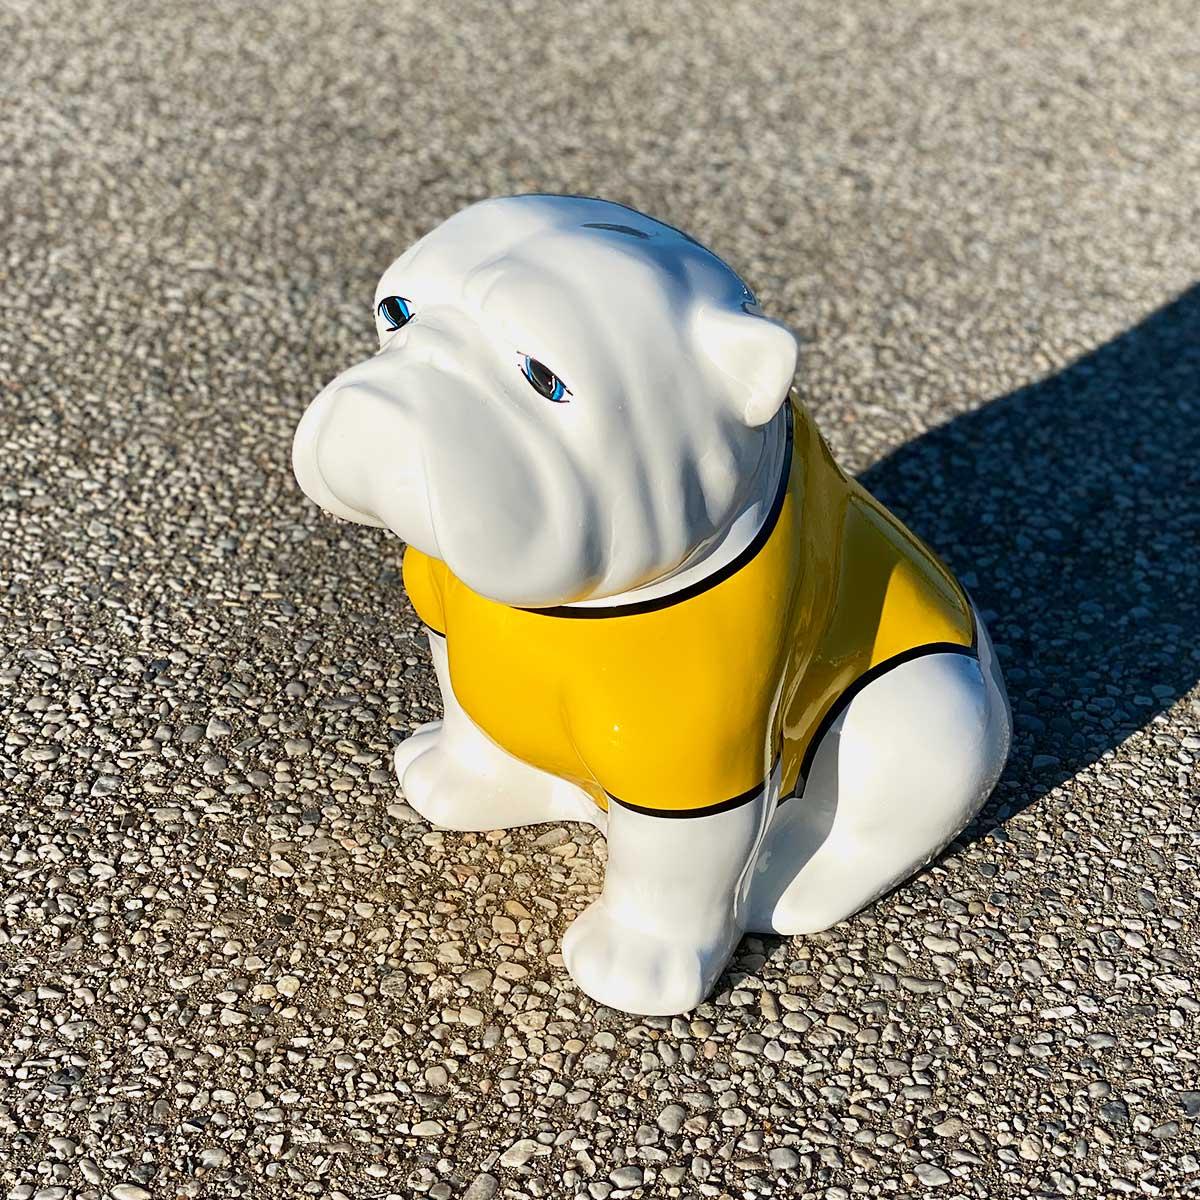 bulldog maillot jaune résine